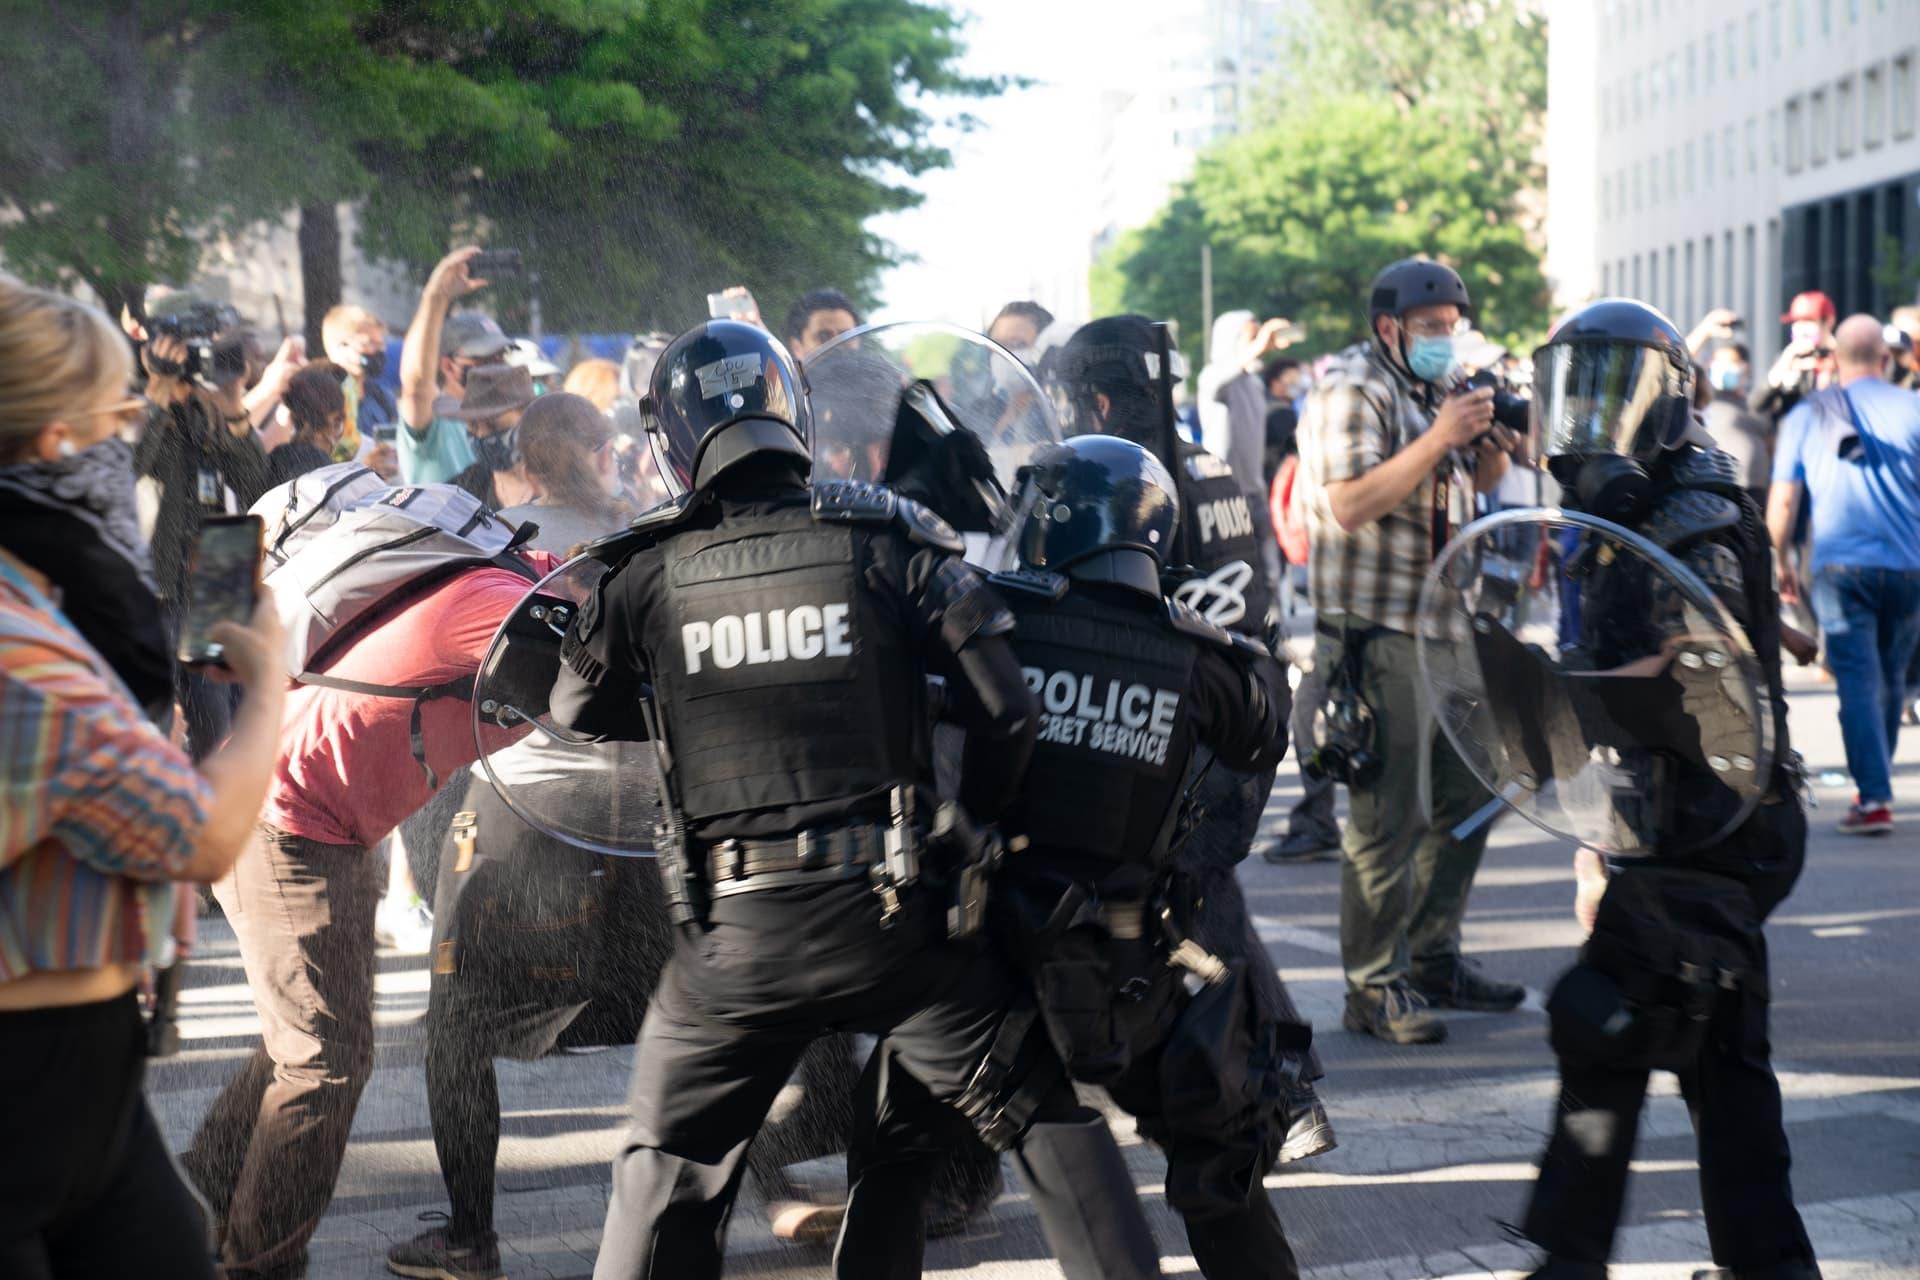 police, brutality, lgbtq, racism